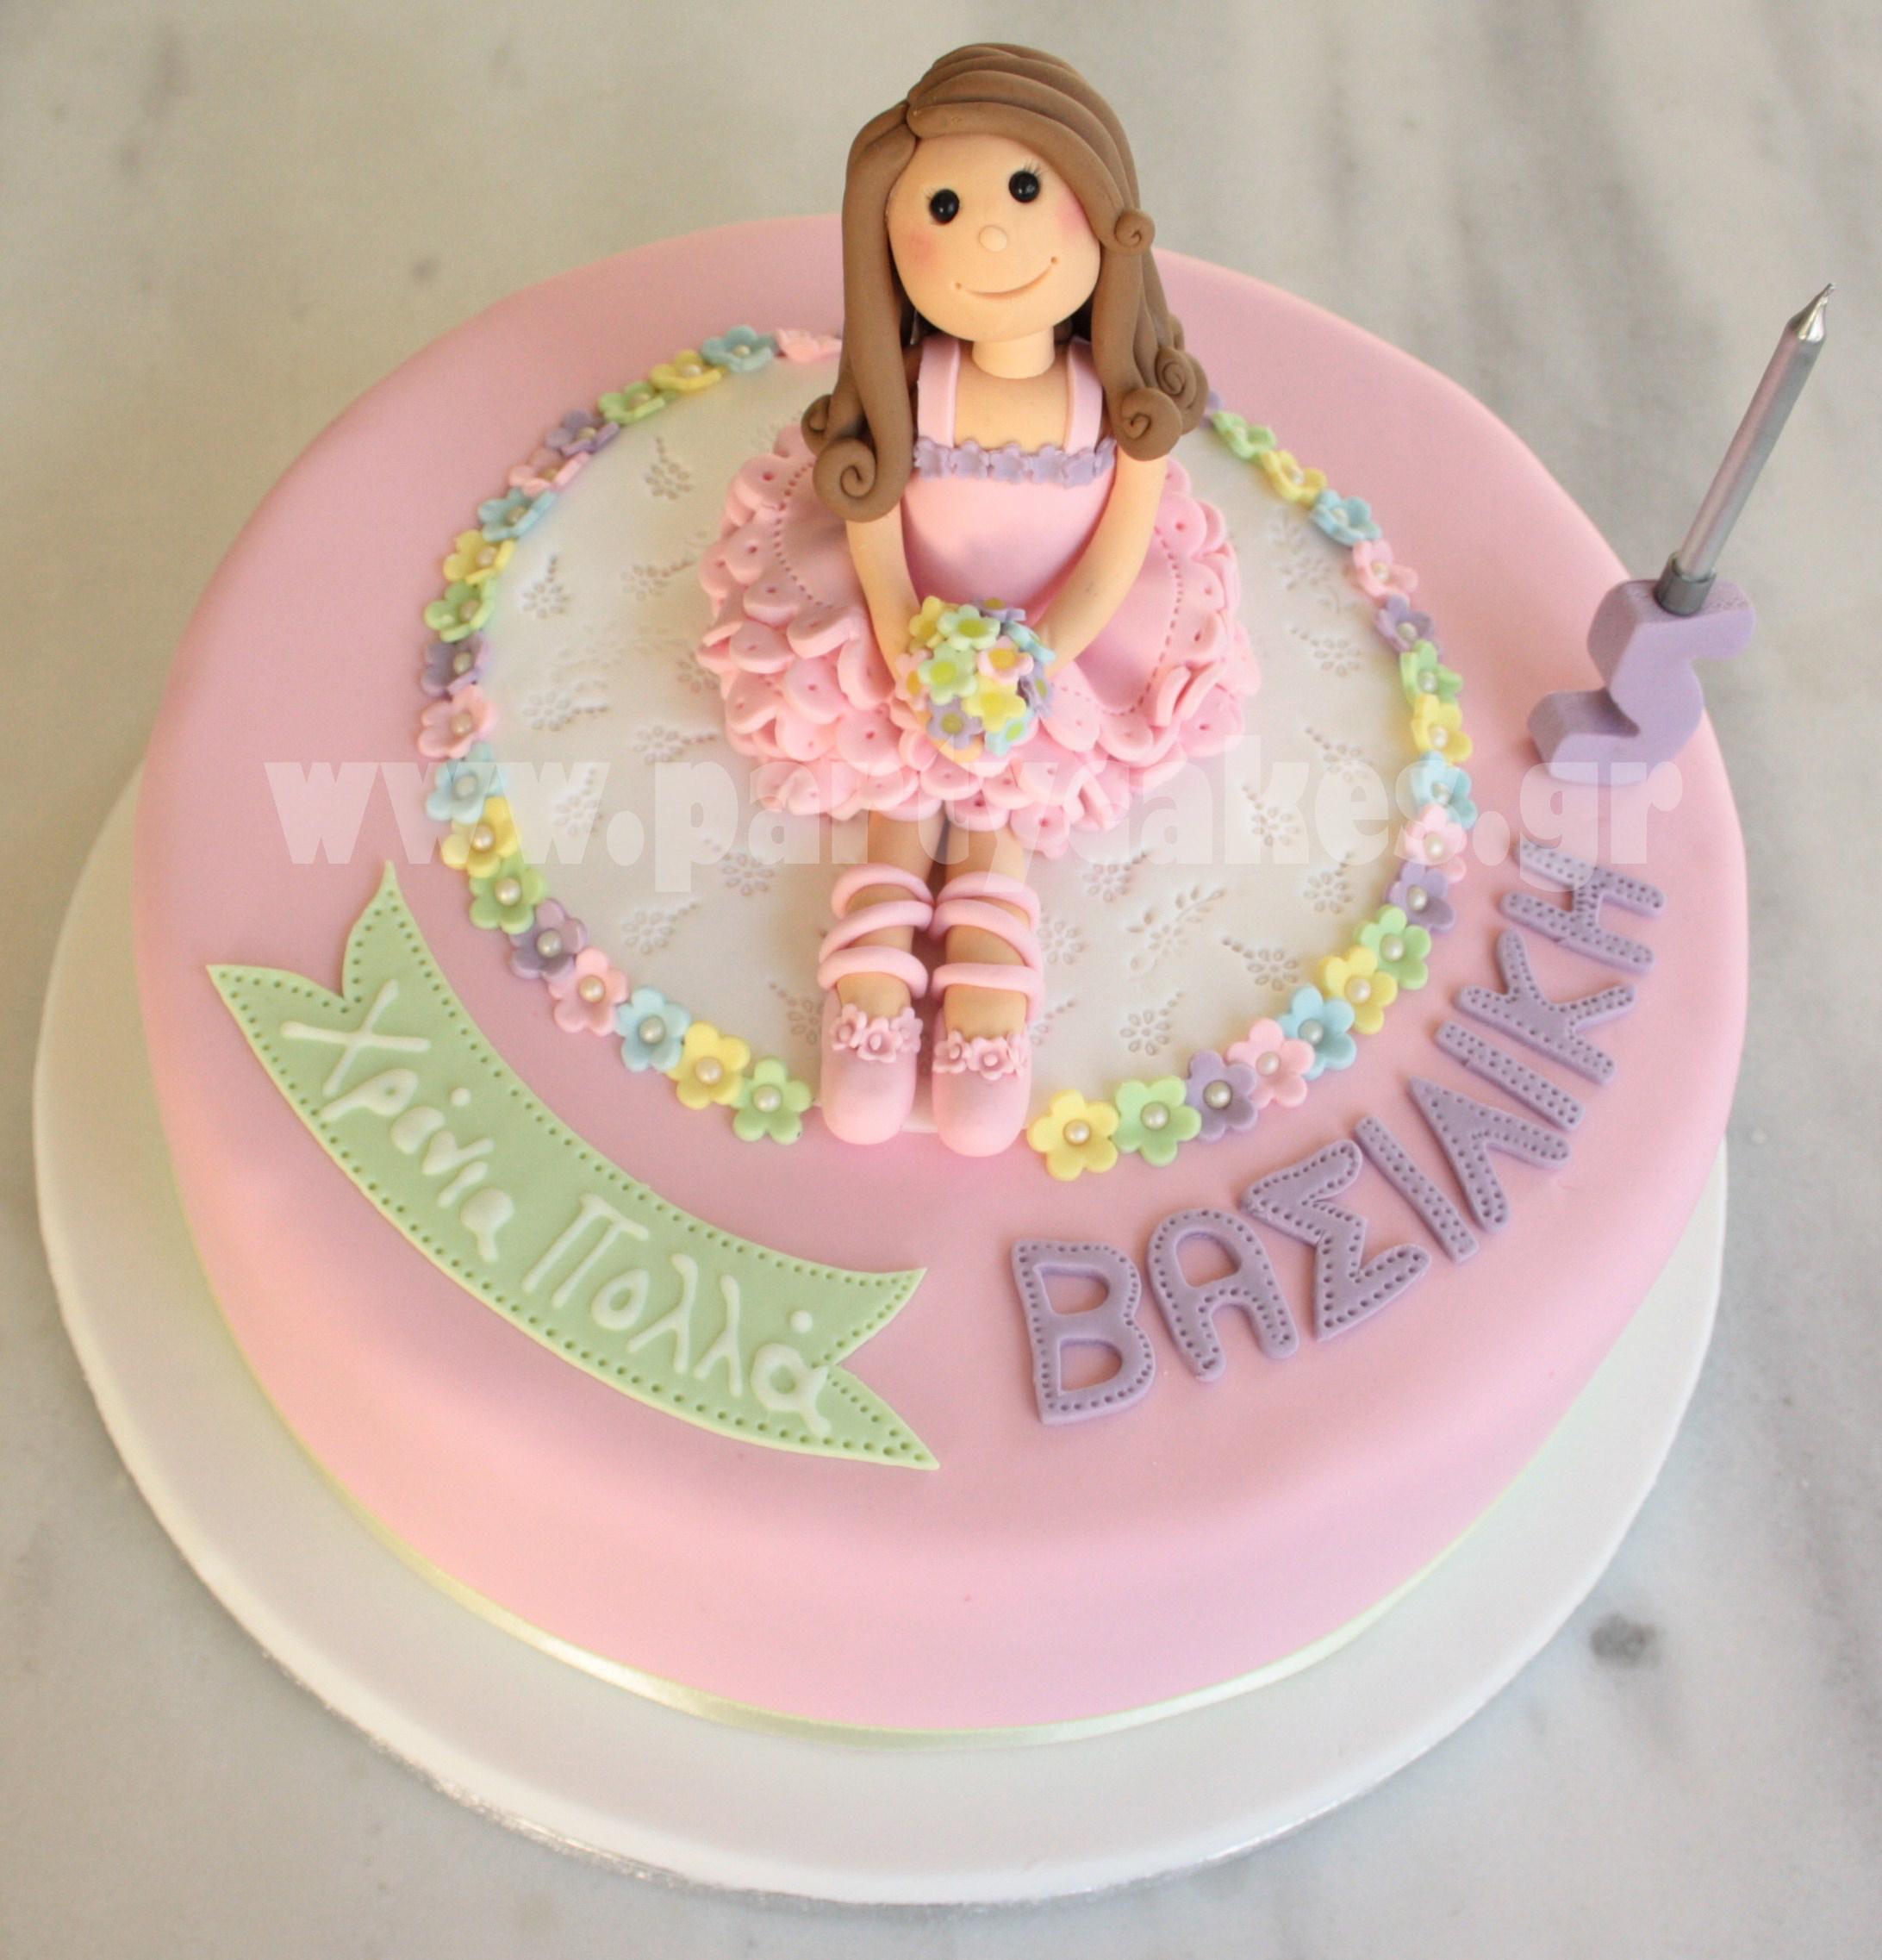 Ballet+cake+1+copy.jpg